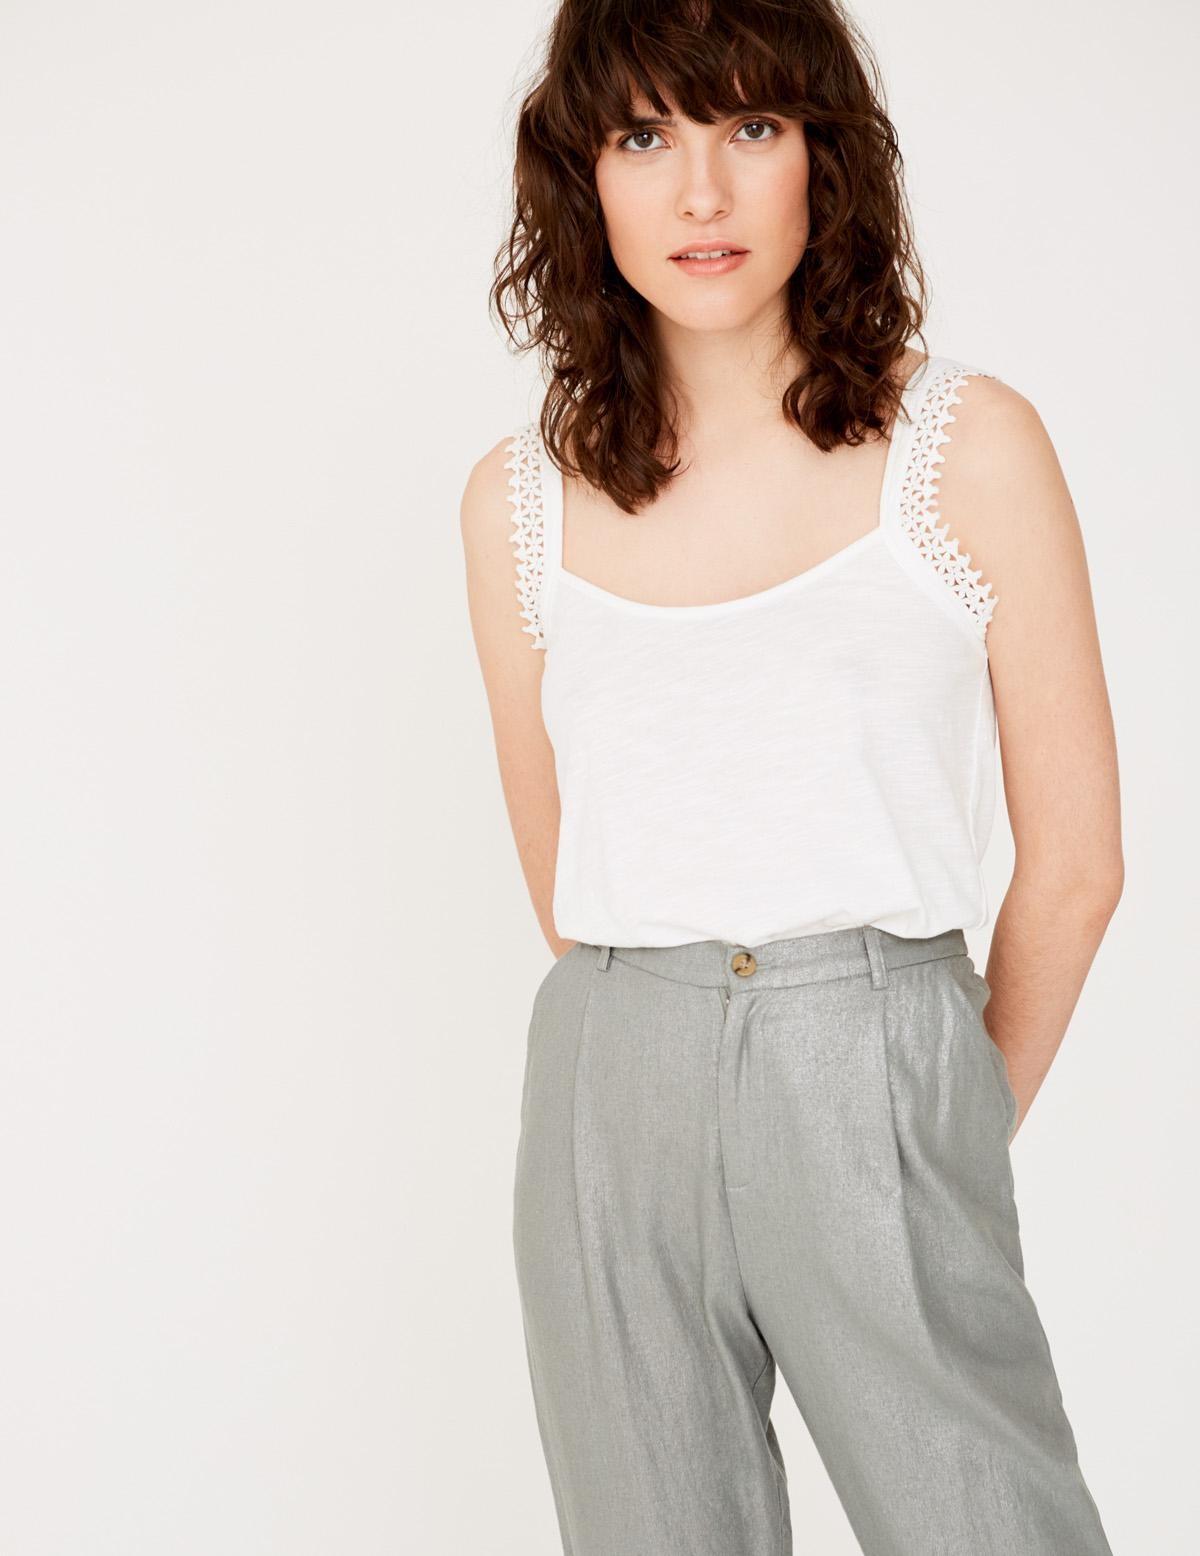 Camiseta tirantes algodón orgánico niña - Ítem2